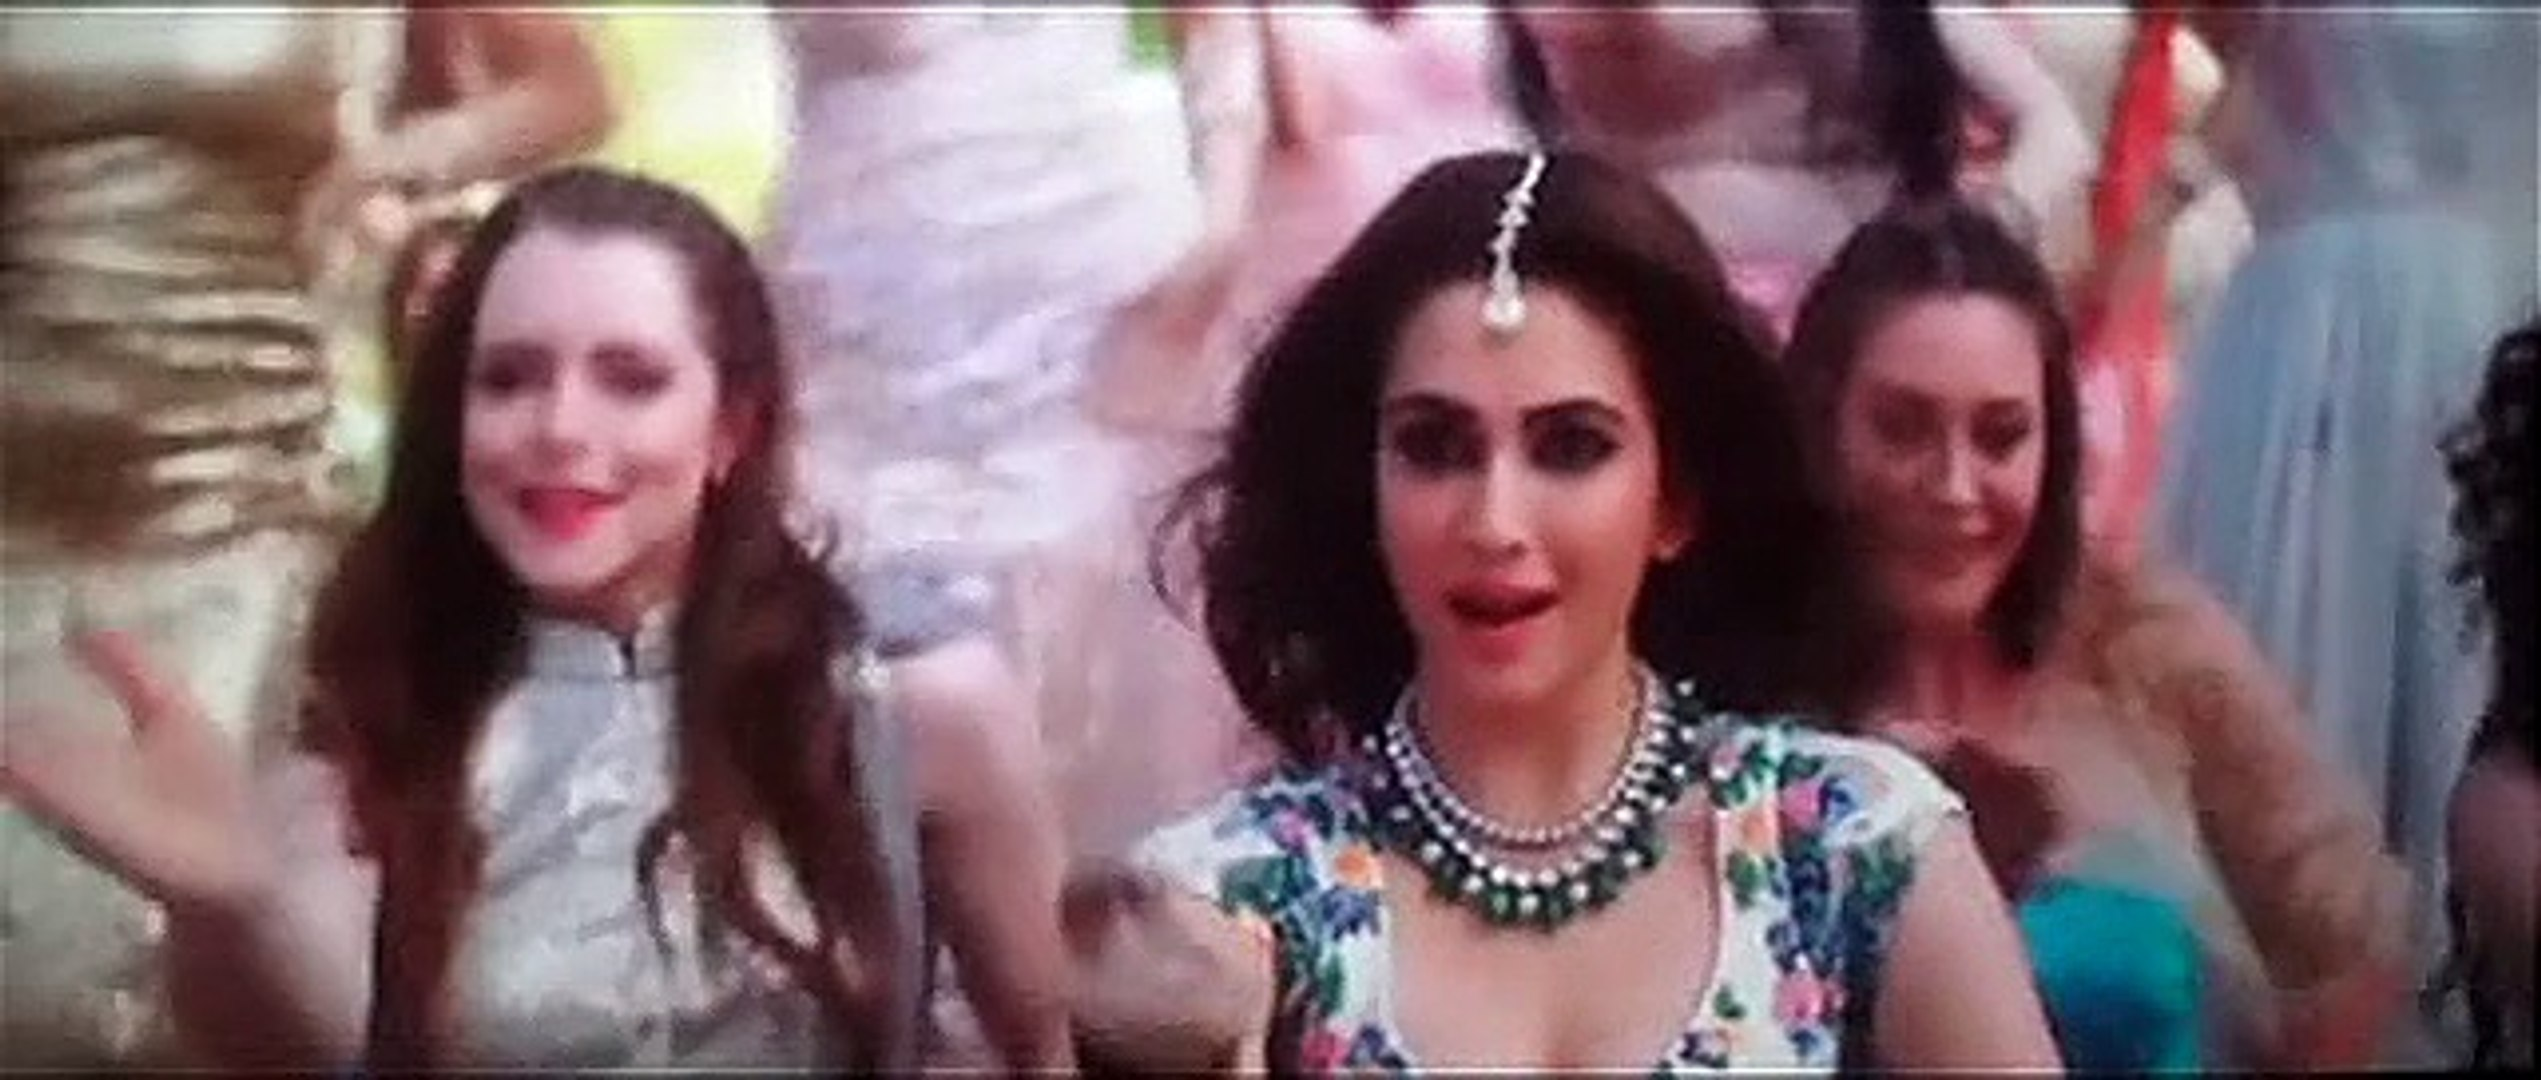 G-u-e-s-t  i-i-n  L-o-n-d-o-n - (2017) Hindi _ PART 2